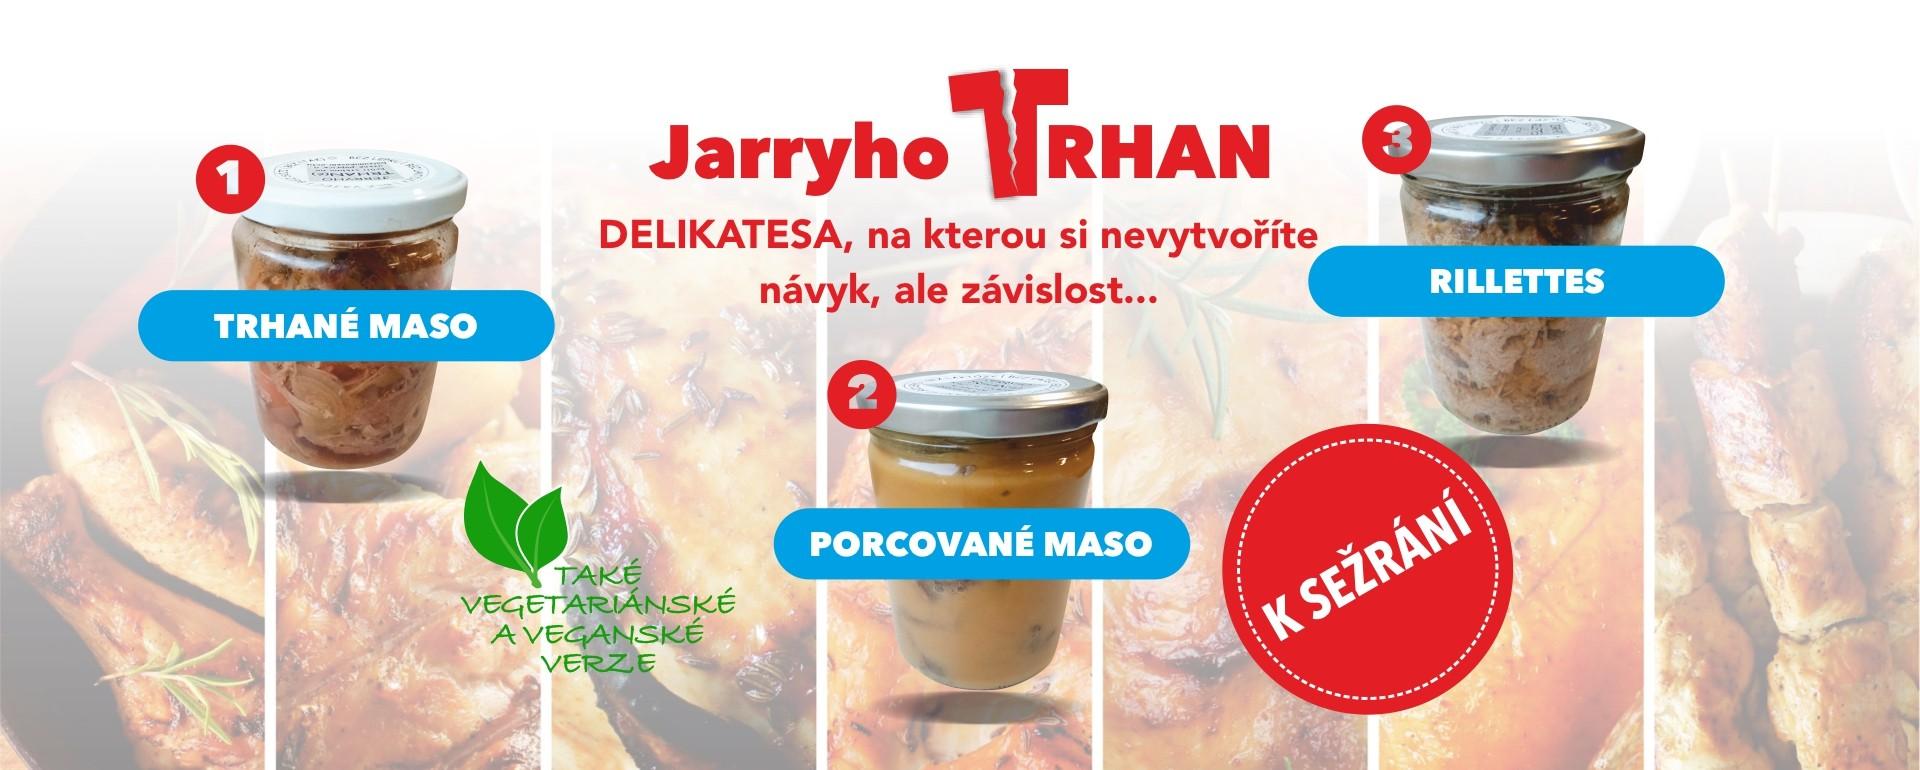 Jarryho Trhani